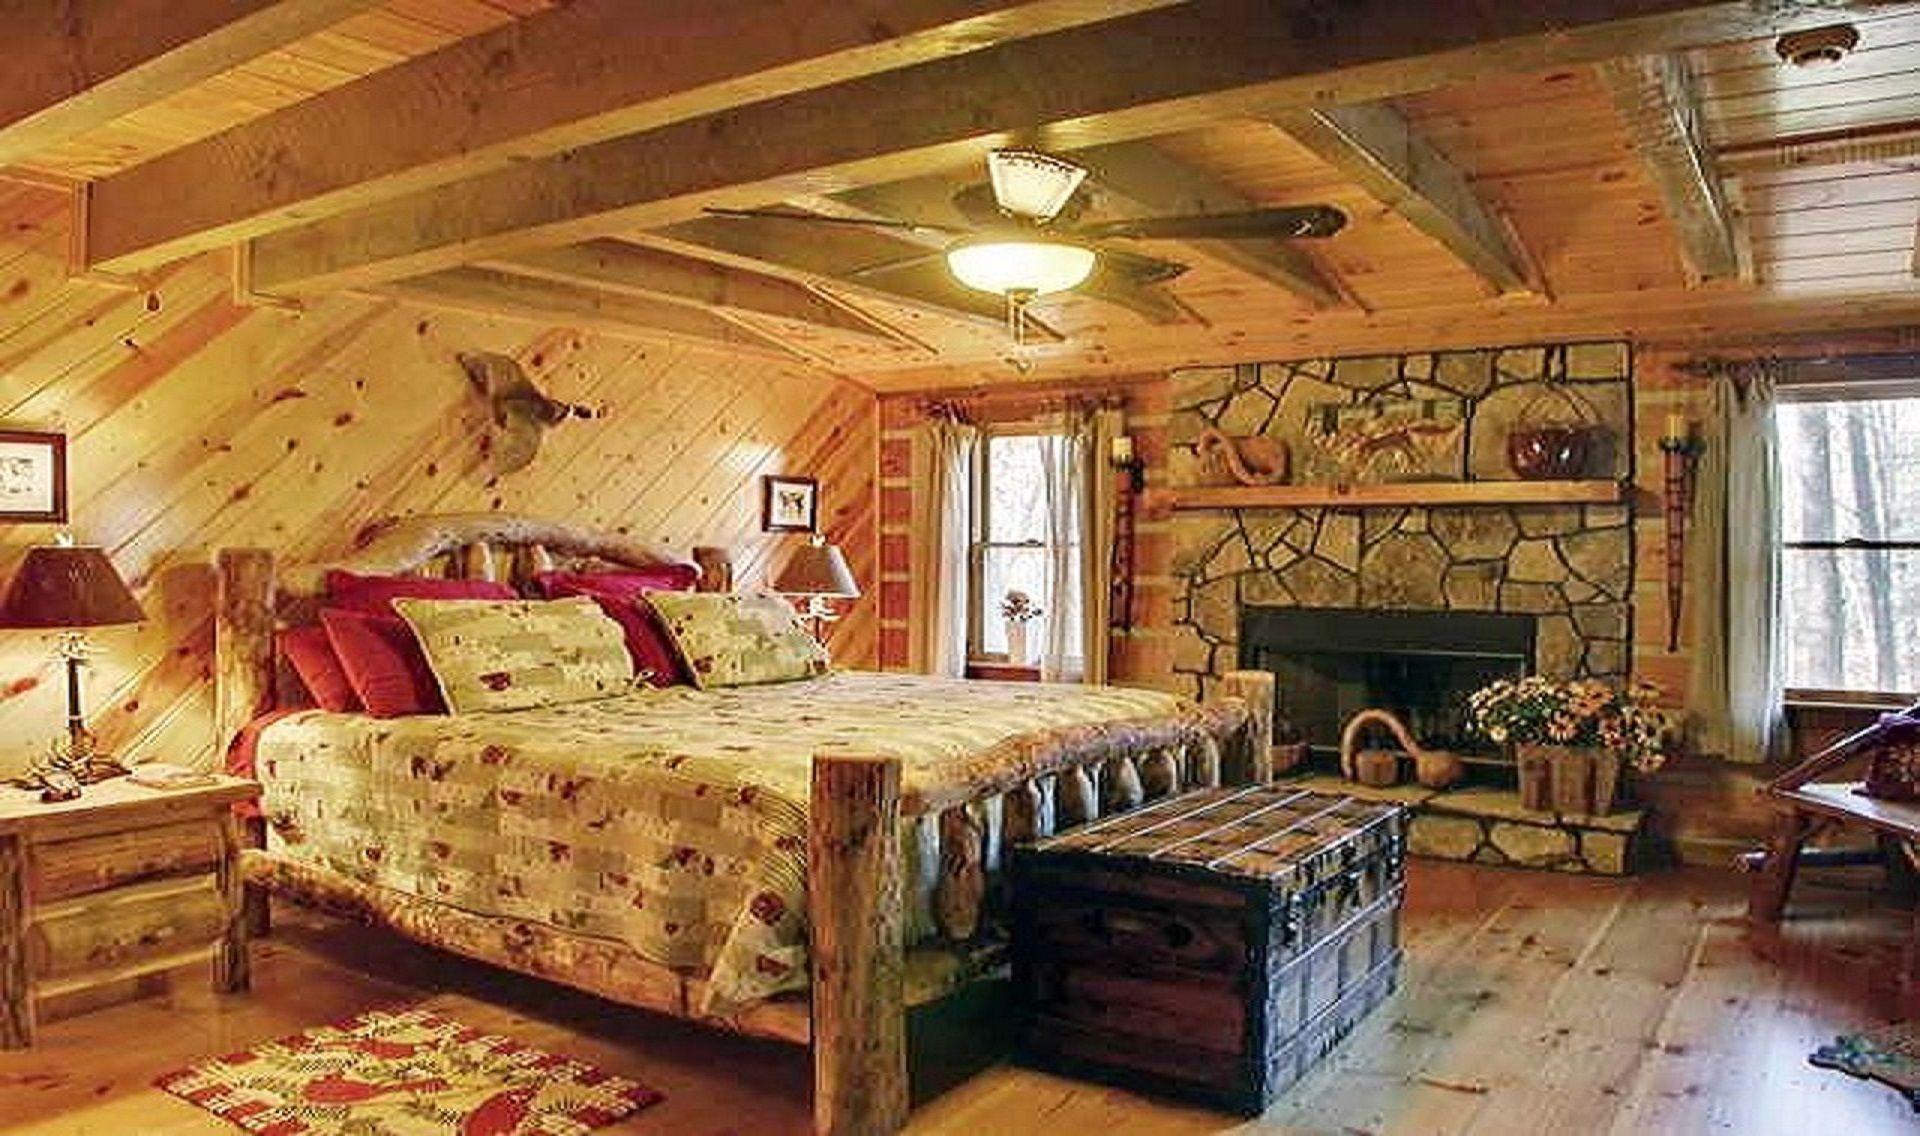 Teenage Beds  Stylish Beds For Teenagers amp Tweens  Room